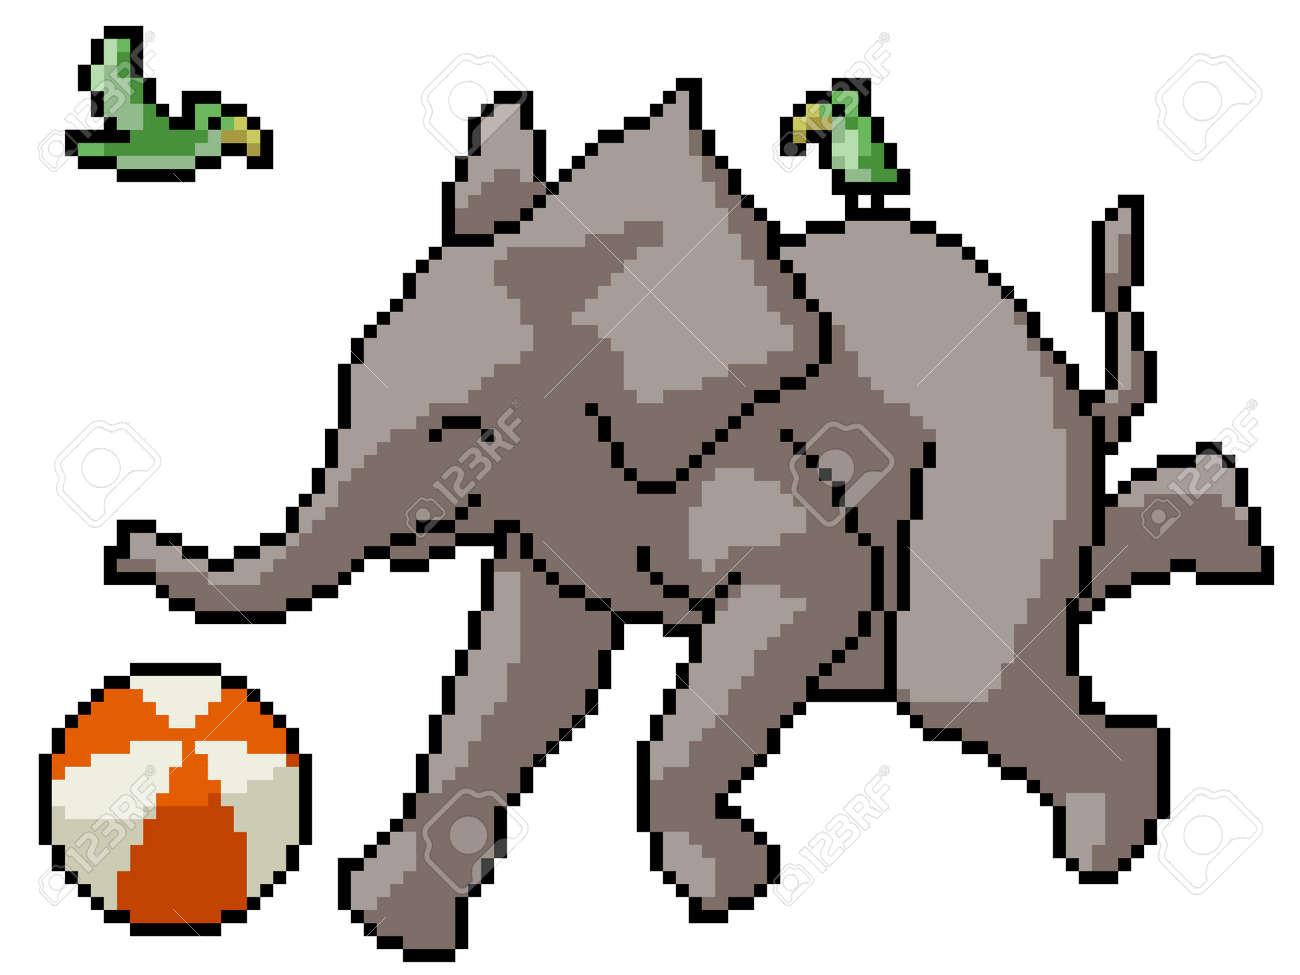 pixel art of happy elephant playing - 172134649